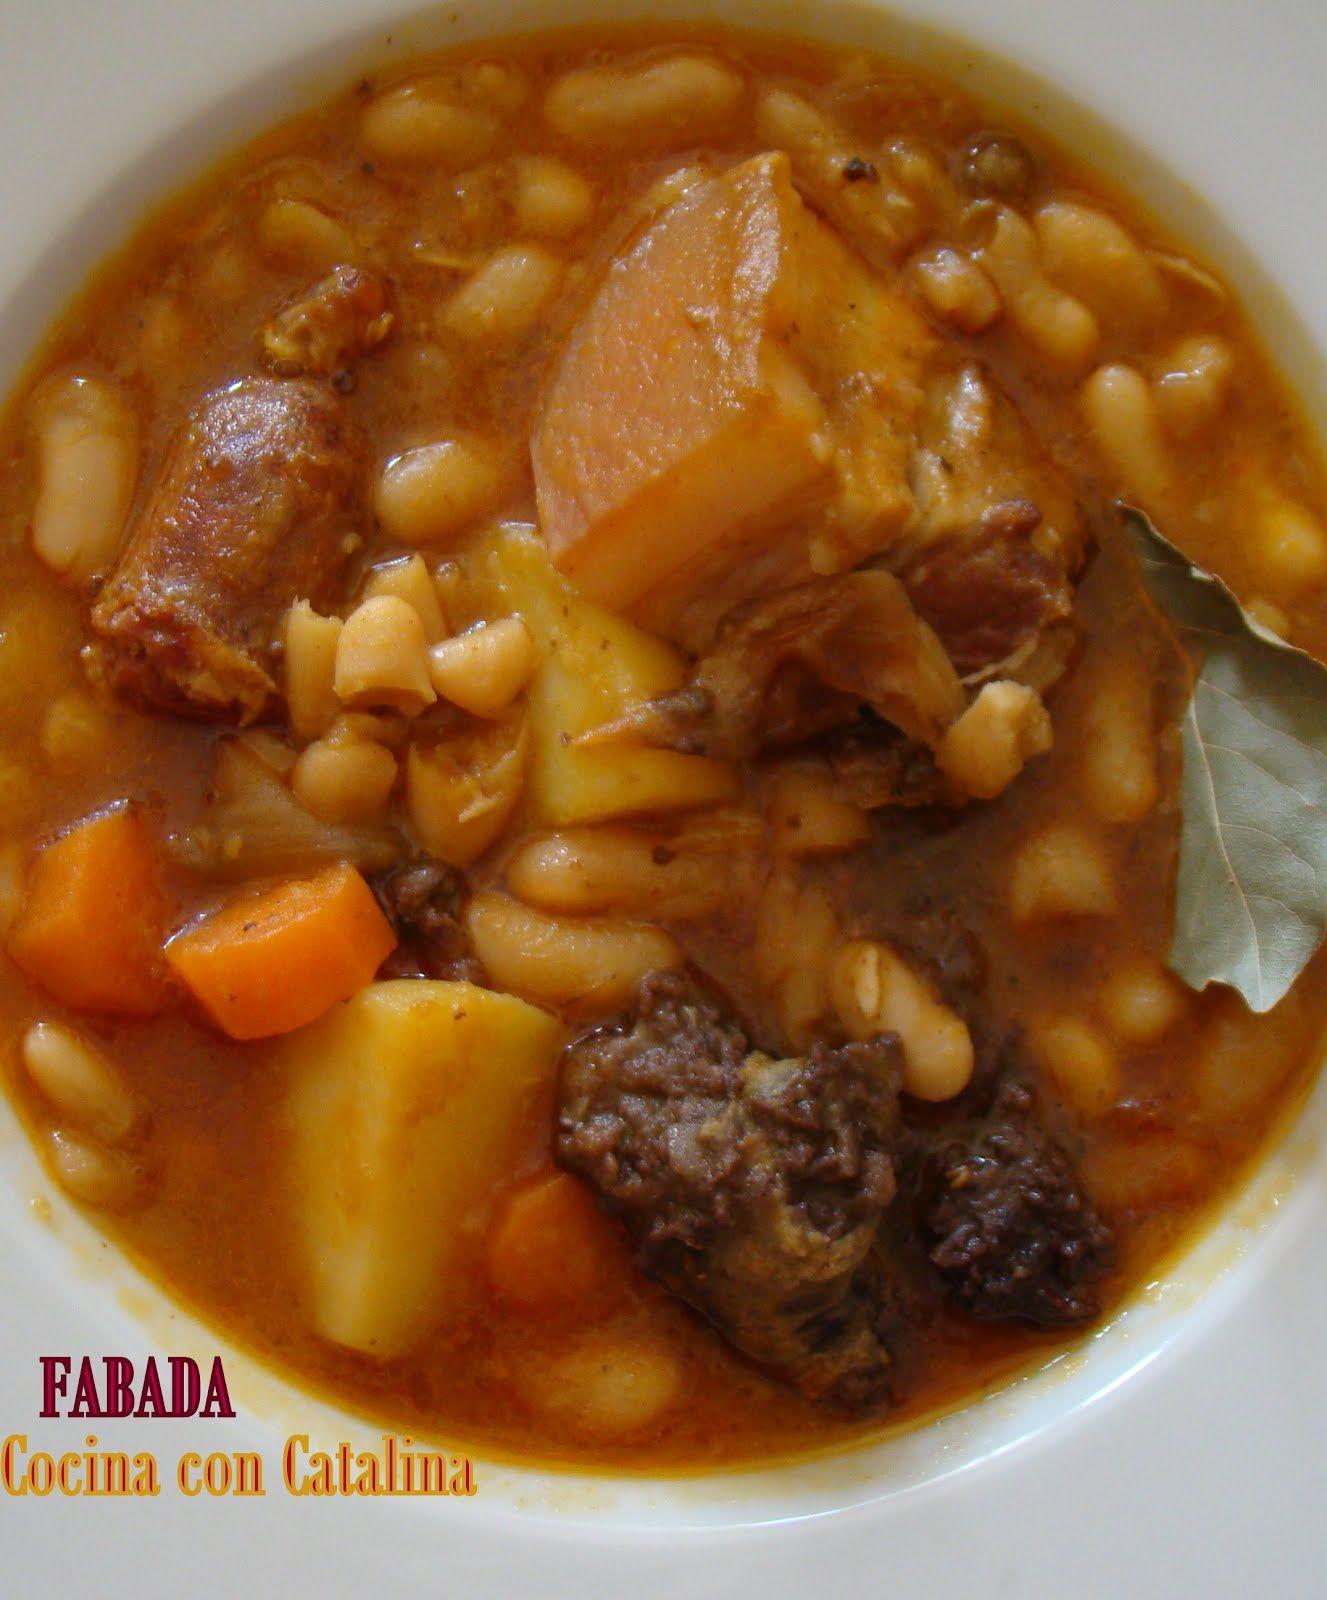 Cocina Con Catalina Potaje De Habichuelas O Fabada Receta De Mi Abuela Recetas De Comida Alubias Con Chorizo Cocina Española Recetas